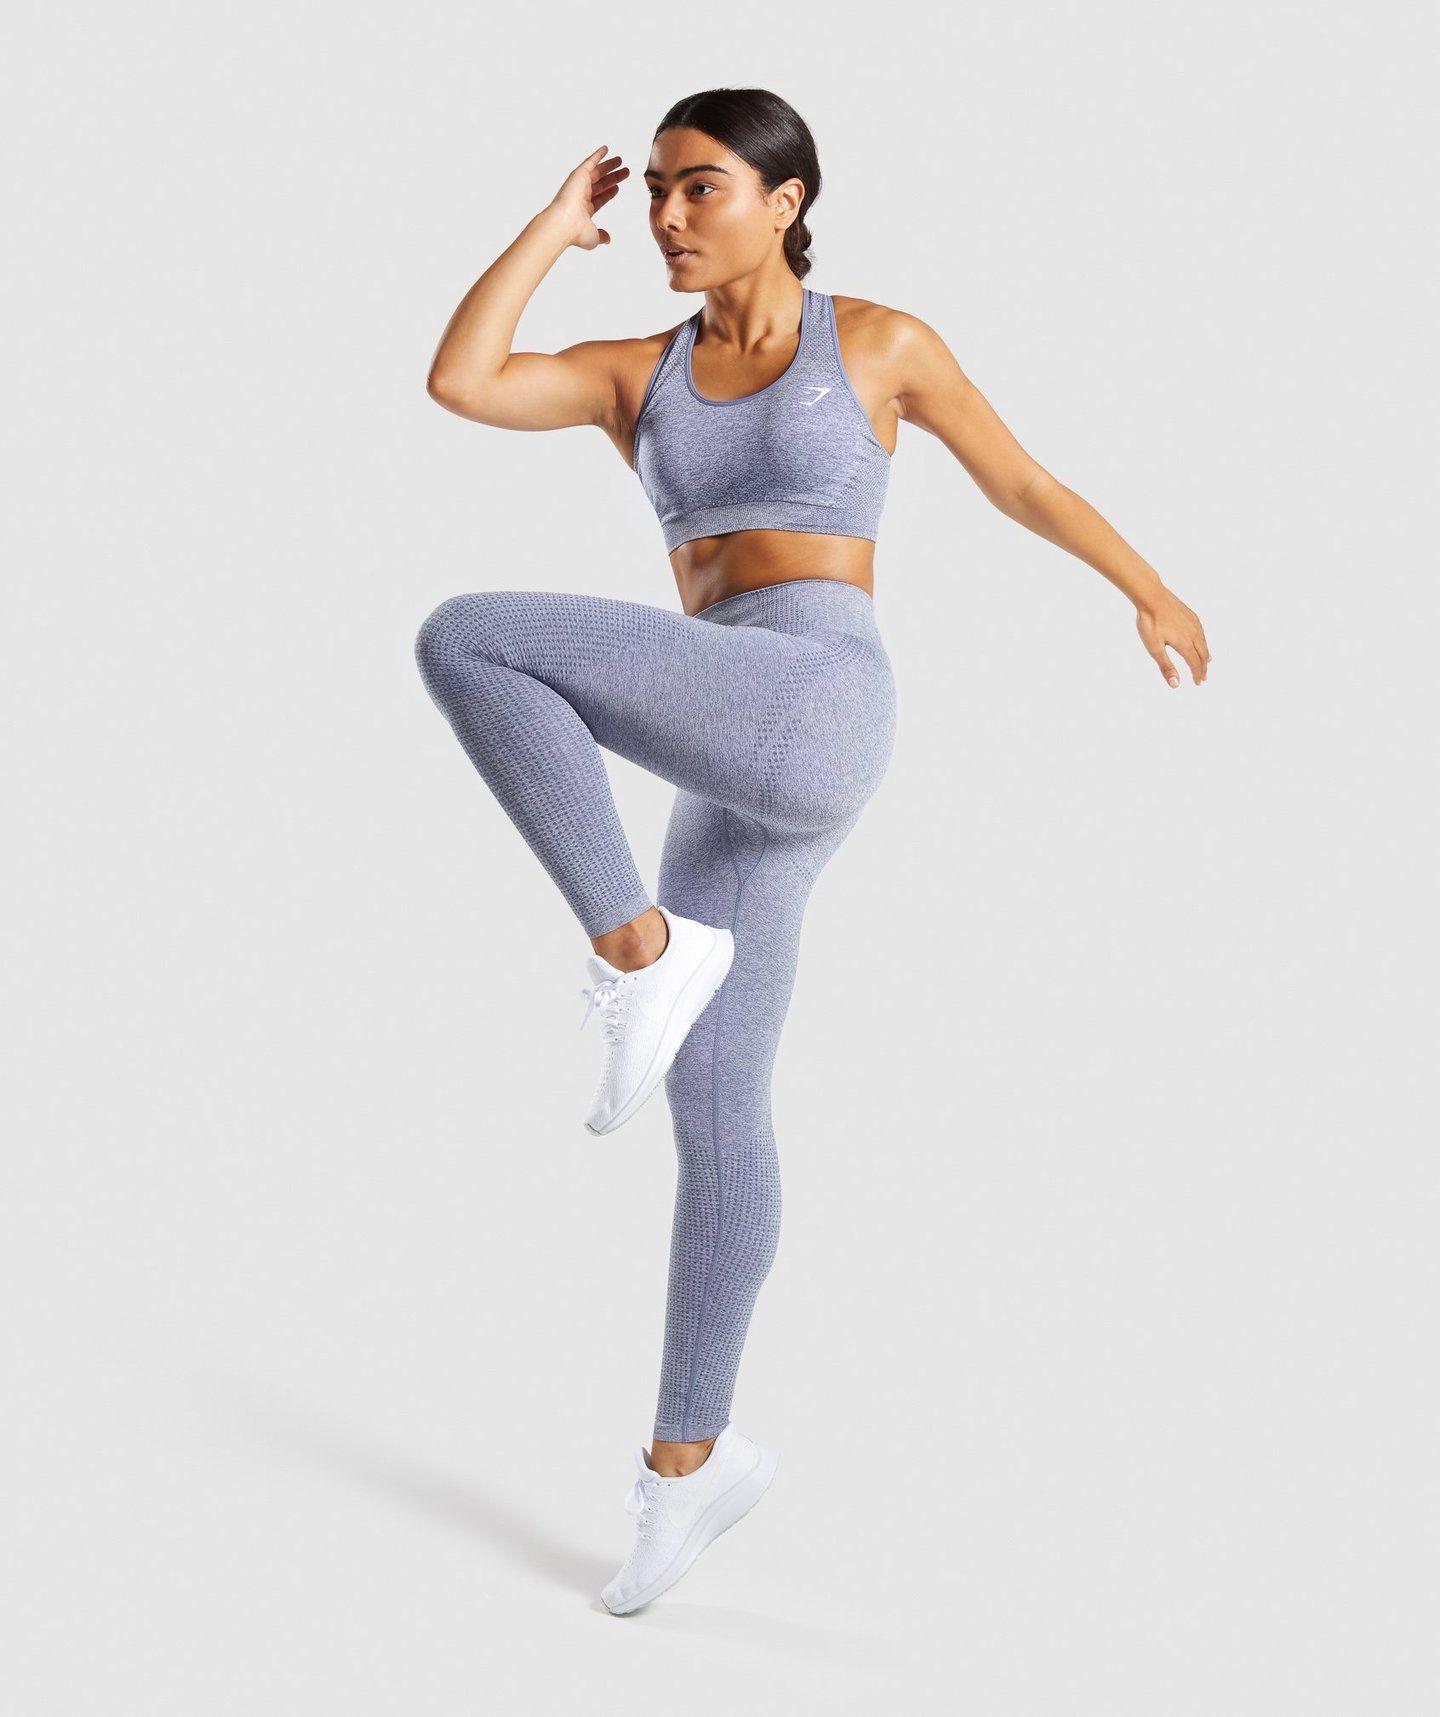 d8d0c18f6cab3 Gymshark Vital Seamless Leggings - Steel Blue Marl 4 I love the leggings!  Either the steel blue merel or black! Medium!